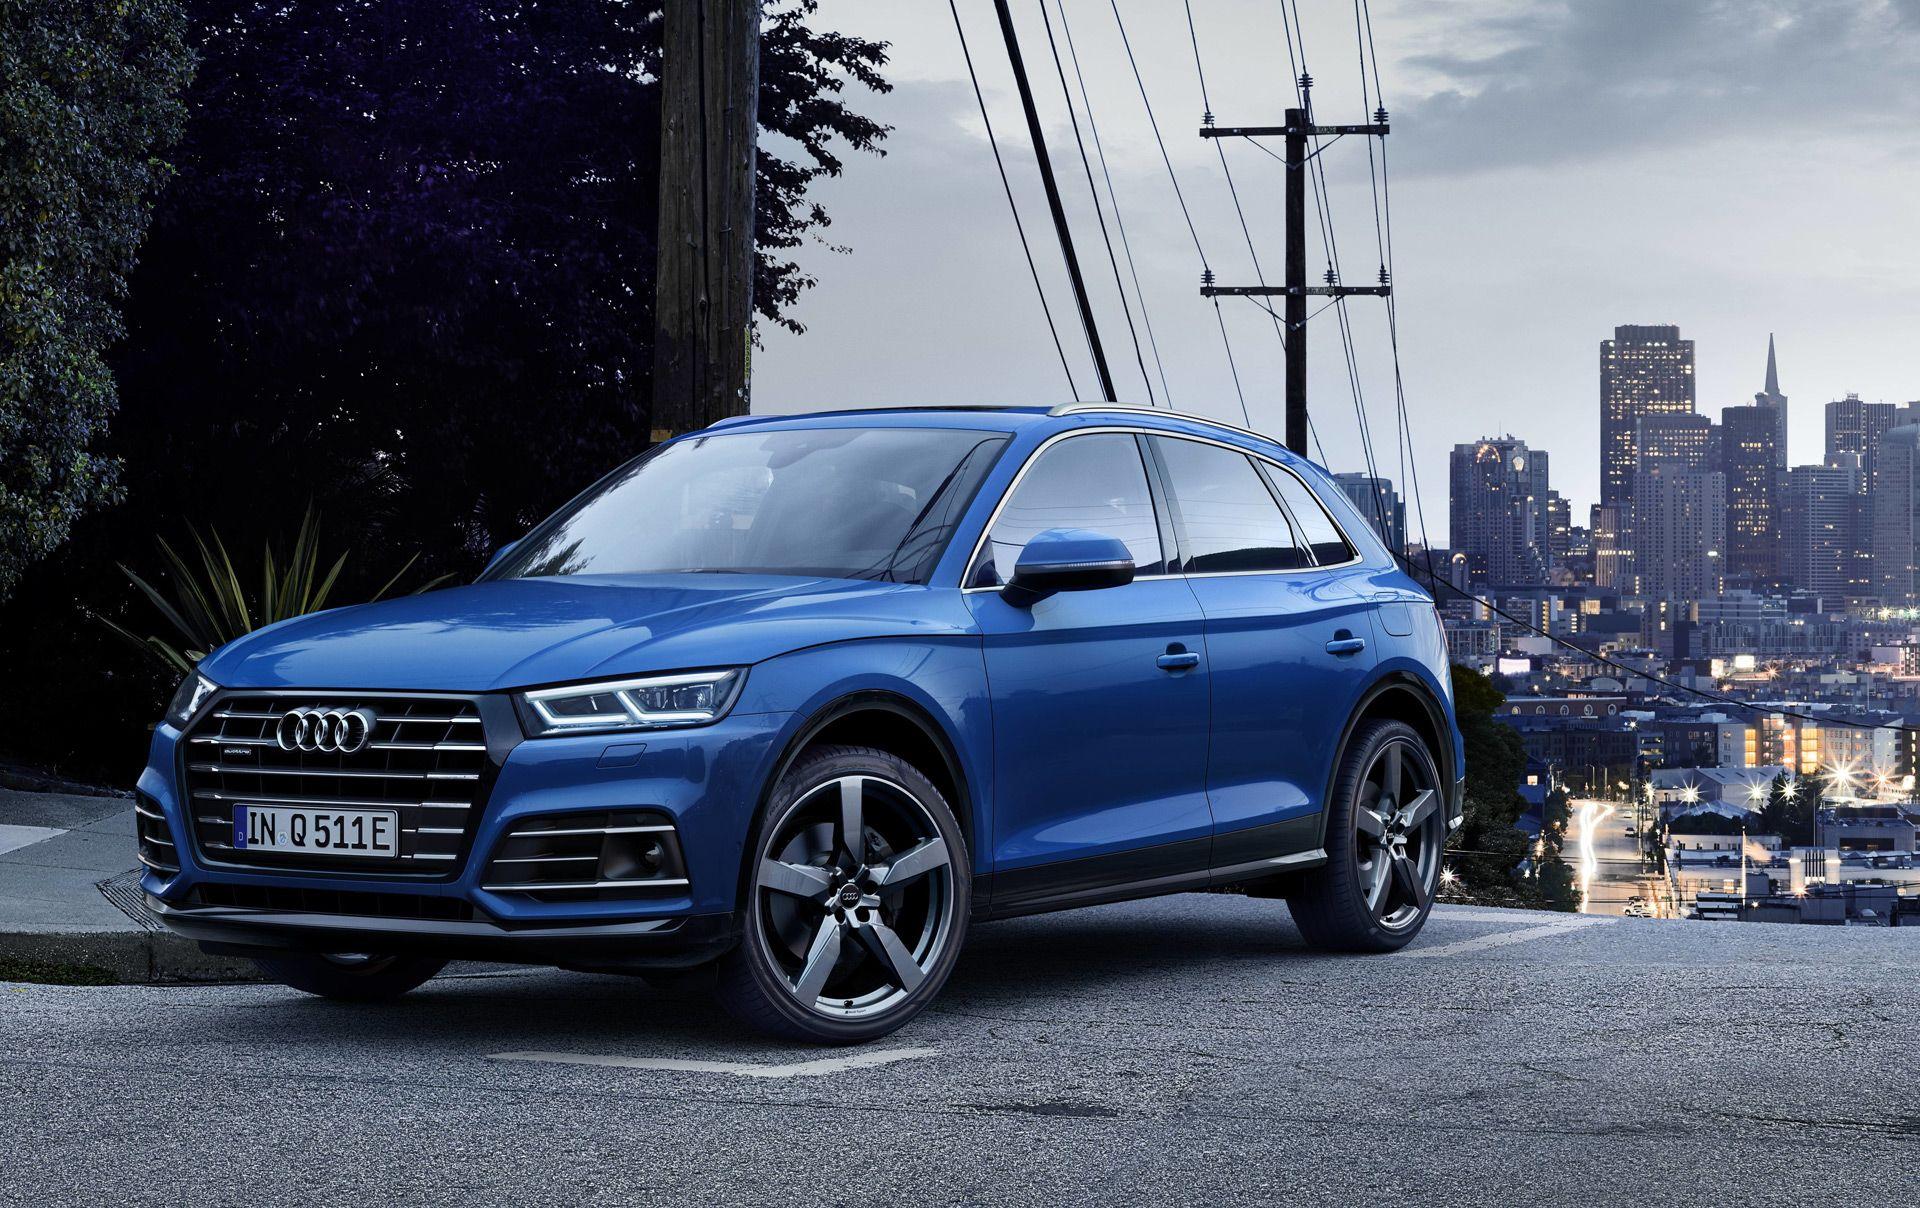 Audi X5 2020 Audi Q5 Audi Hybrid Car